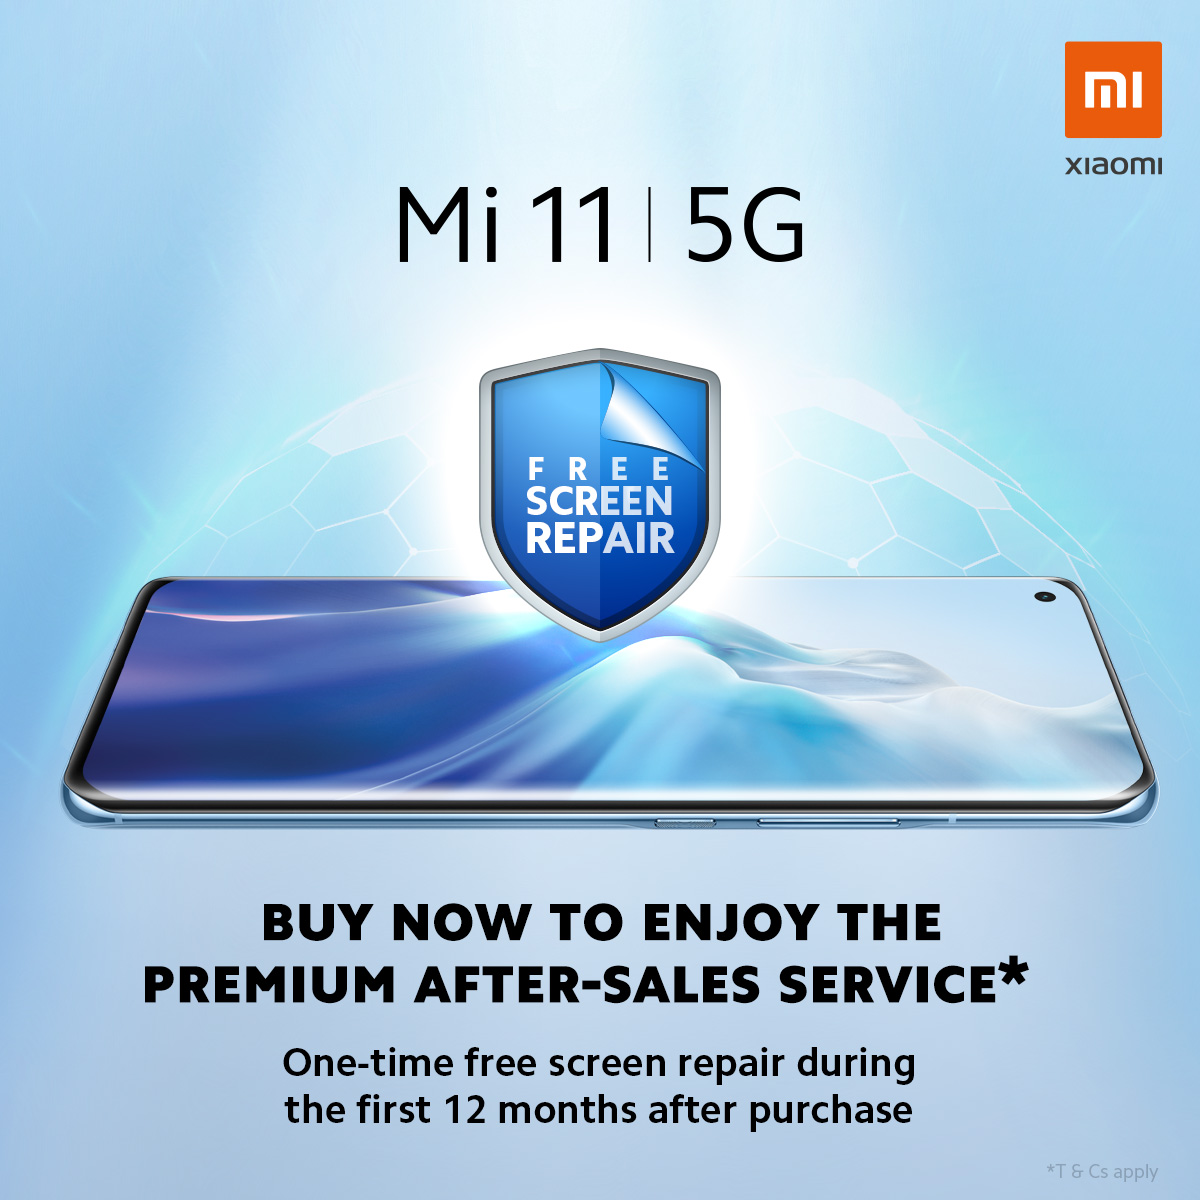 Free Screen Repair with Xiaomi Mi 11 deals